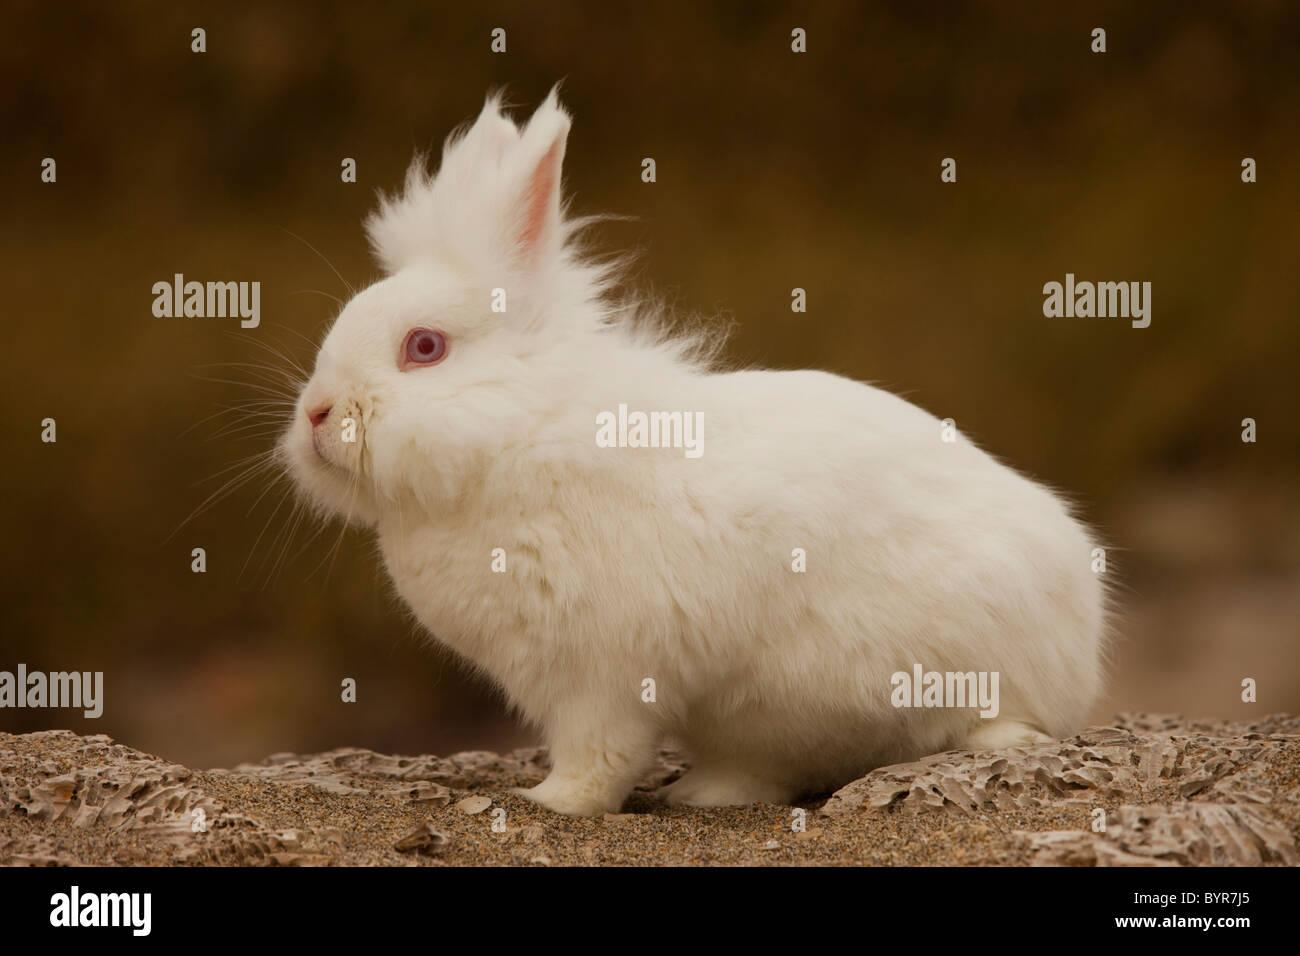 White bunny rabbit on rock - Stock Image